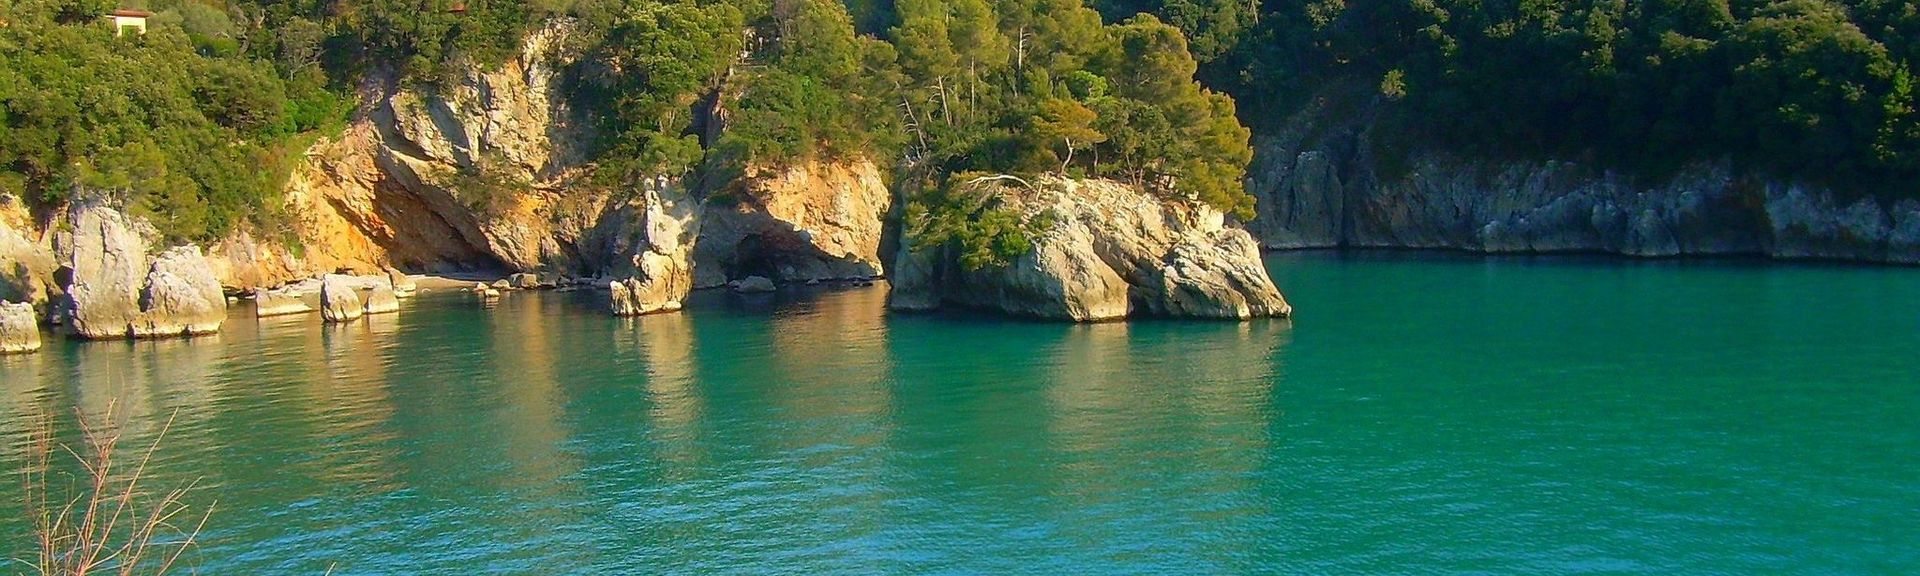 Beverino, Liguria, Italia